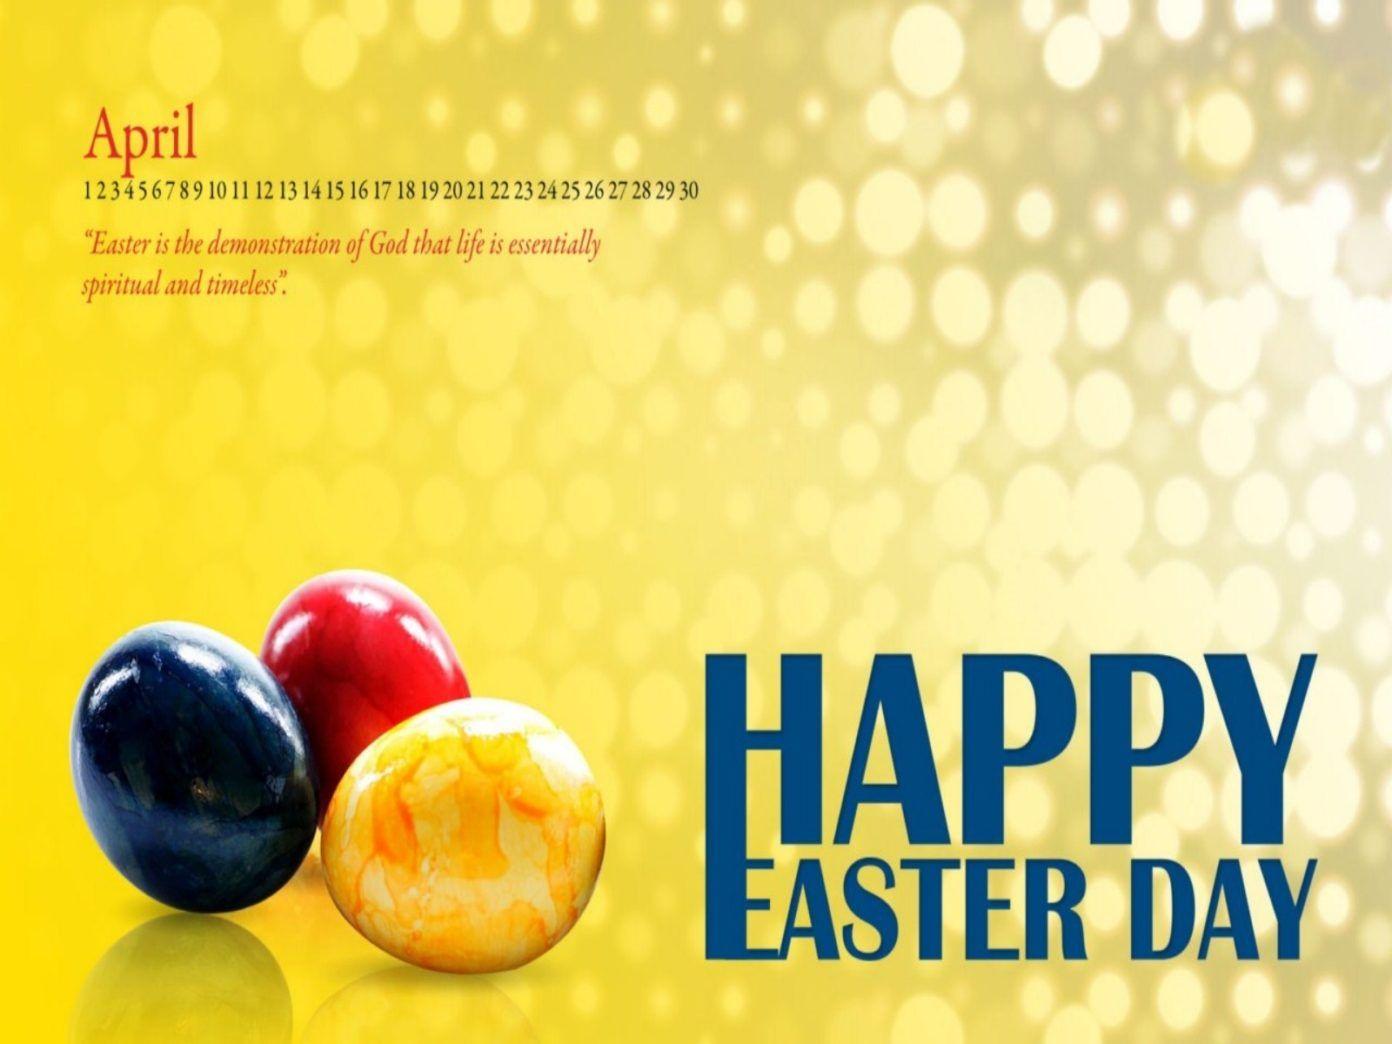 Easter Dates 2019 - Free Download Printable Calendar Templates